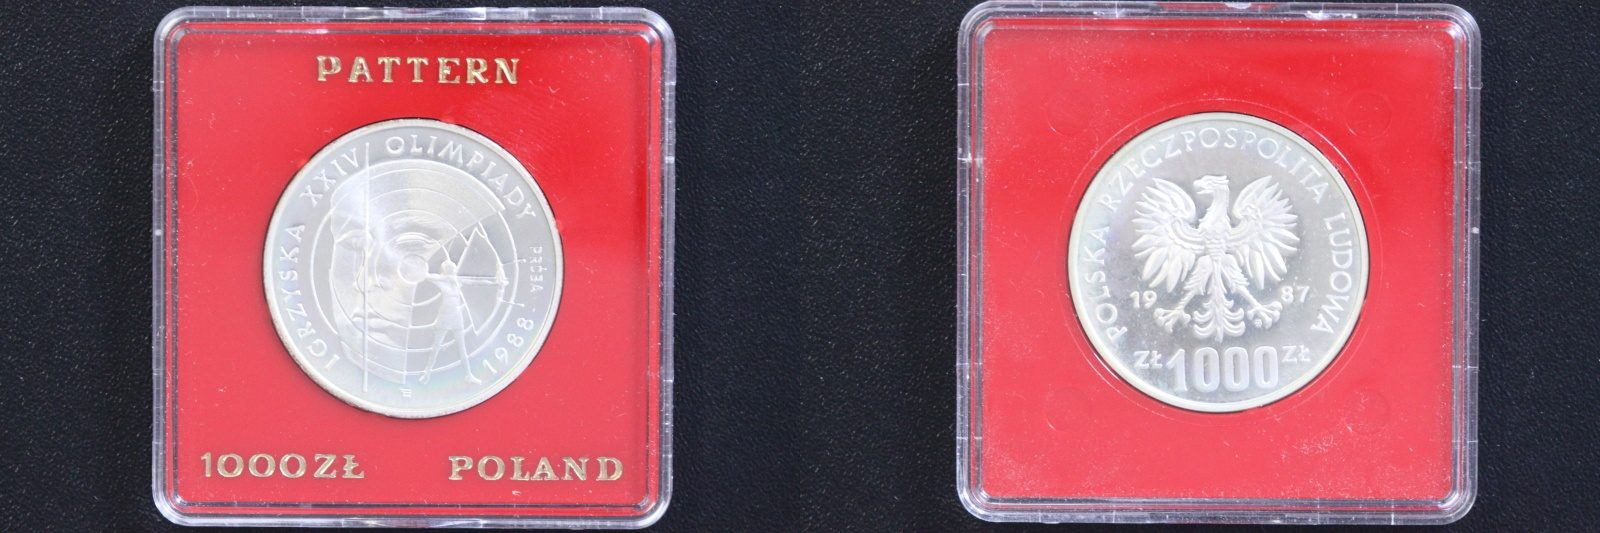 1000 Zloty 1986 Polen PROBE - Oly. Seoul 1988 - Bogenschießen PP